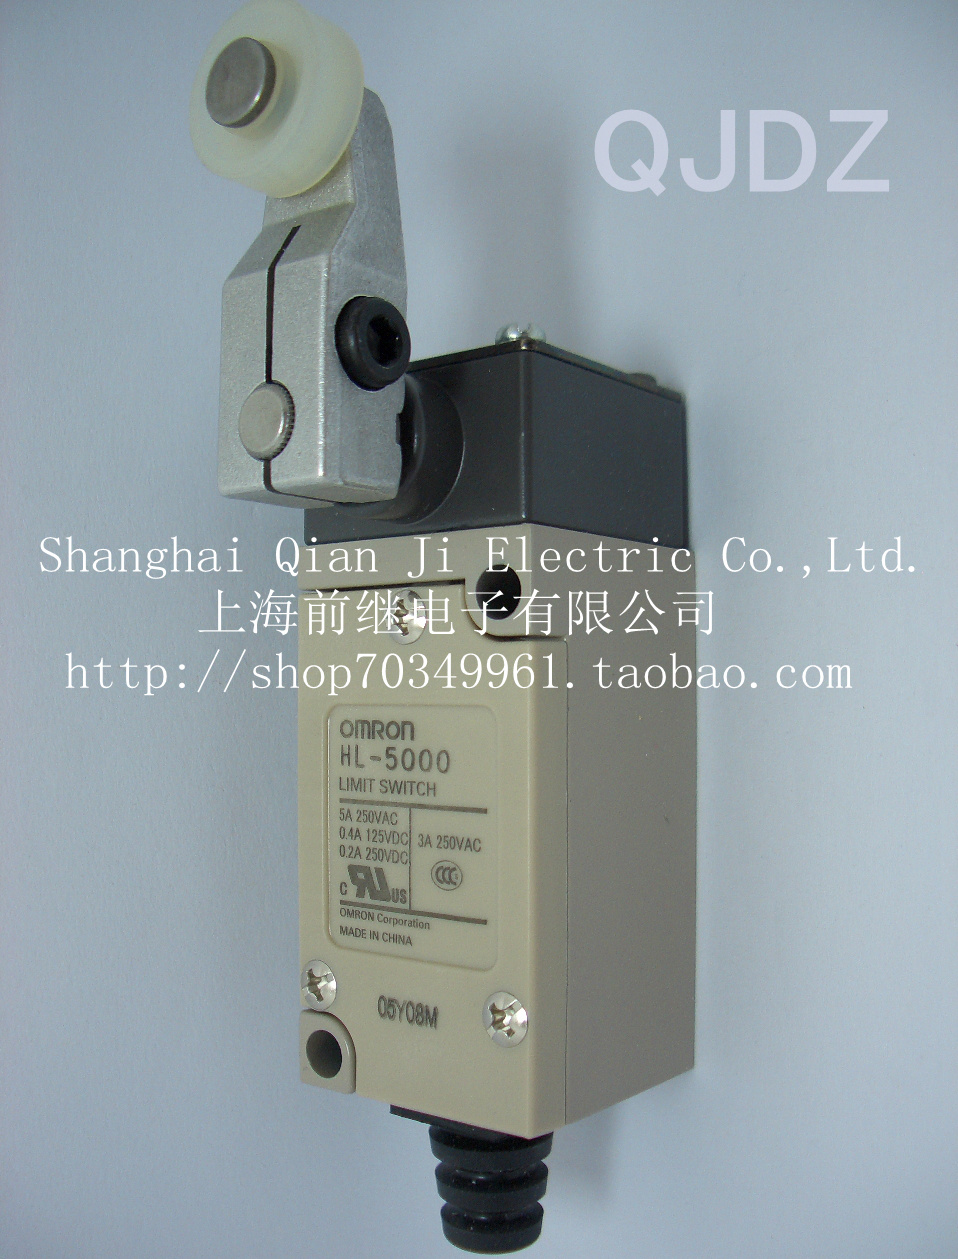 HL-5000 HL-5000 industrial control limit switch<br>